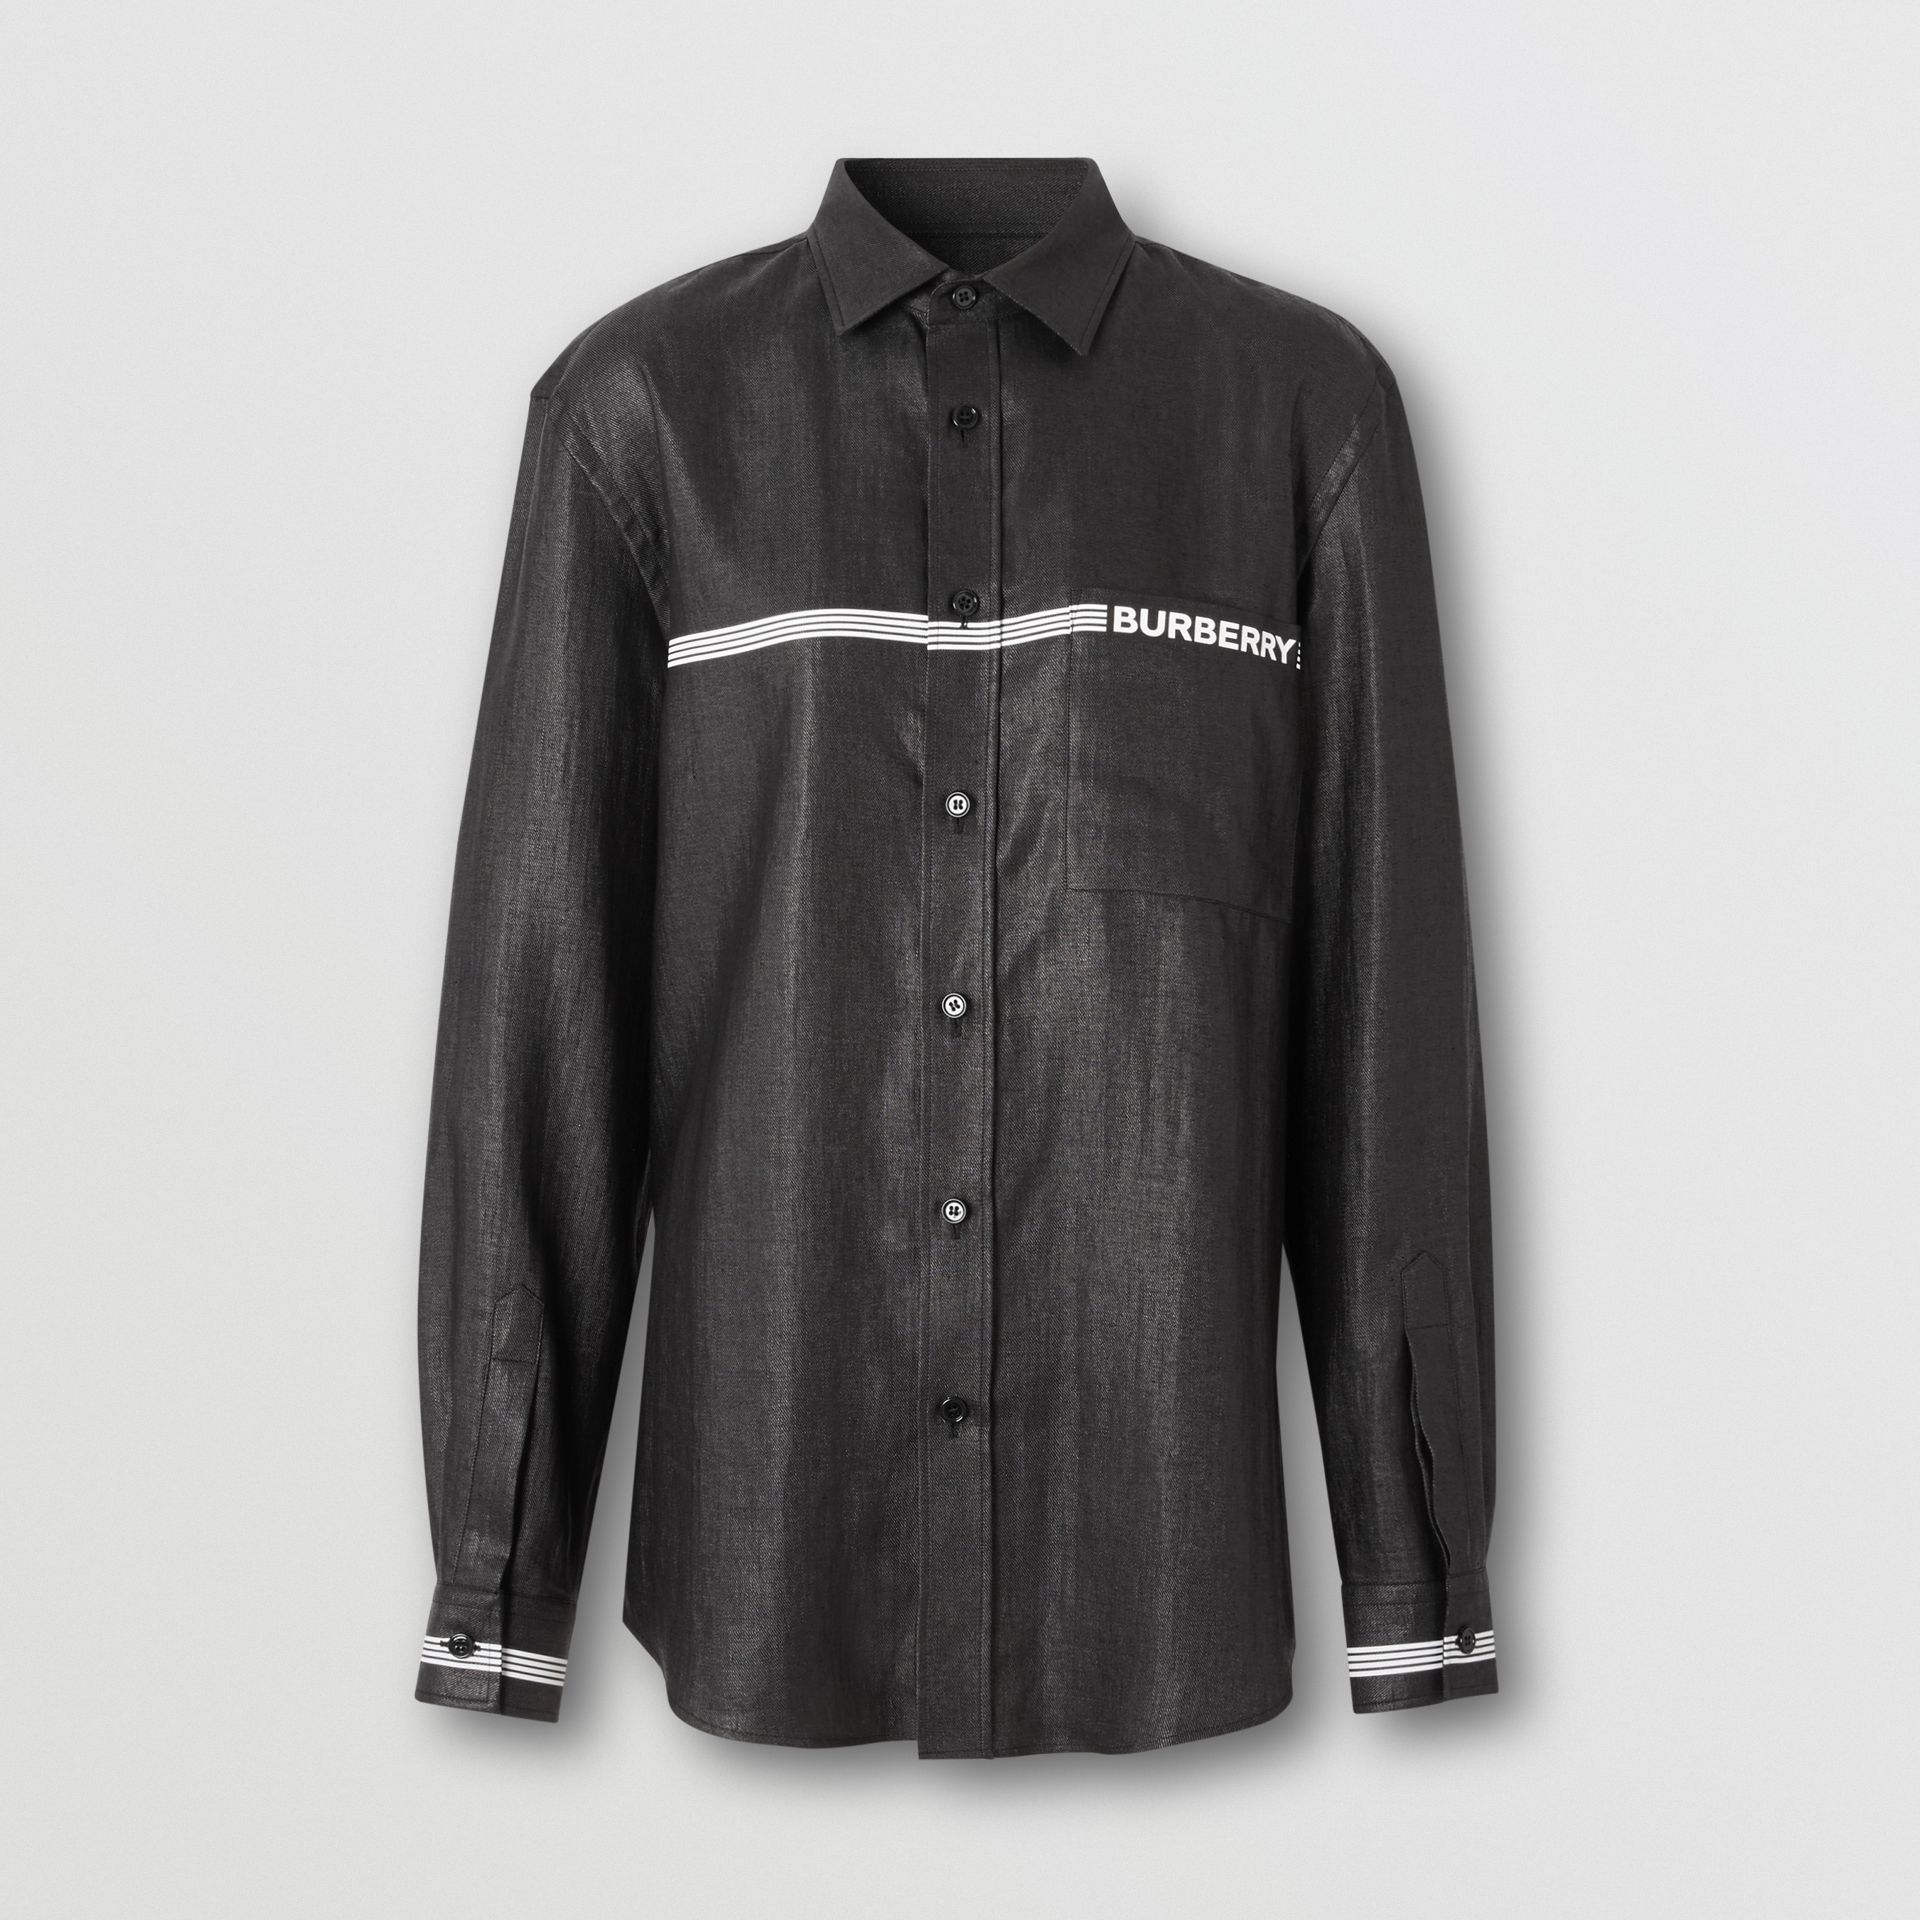 Logo Print Linen Blend Shirt in Black | Burberry - gallery image 3